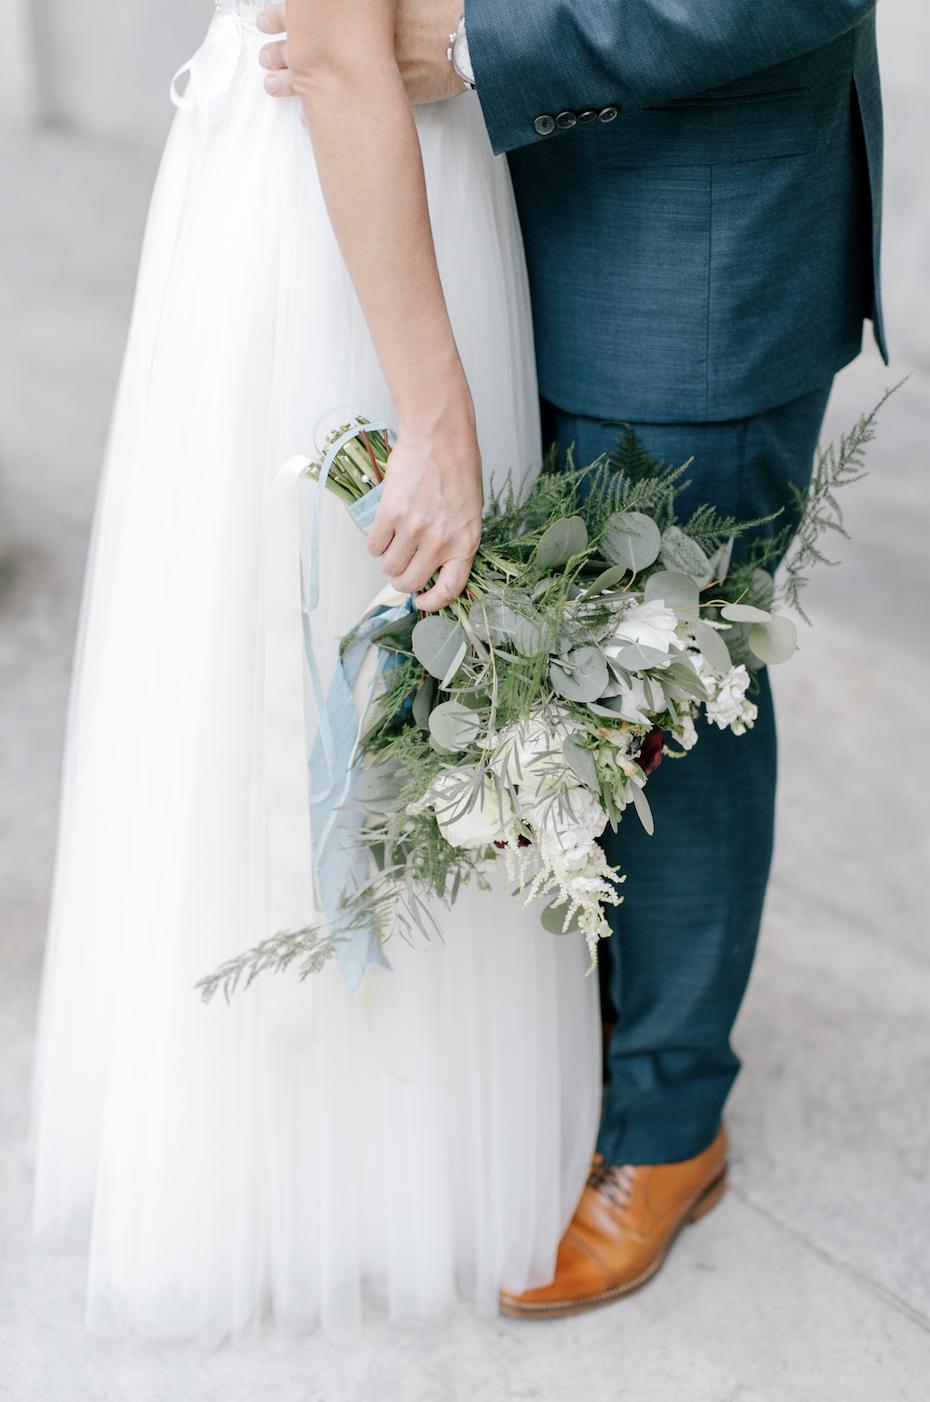 Jen + Billy's Philadelphia Wedding // florals by Devon + Pinkett // photo by Emily Wren Photography